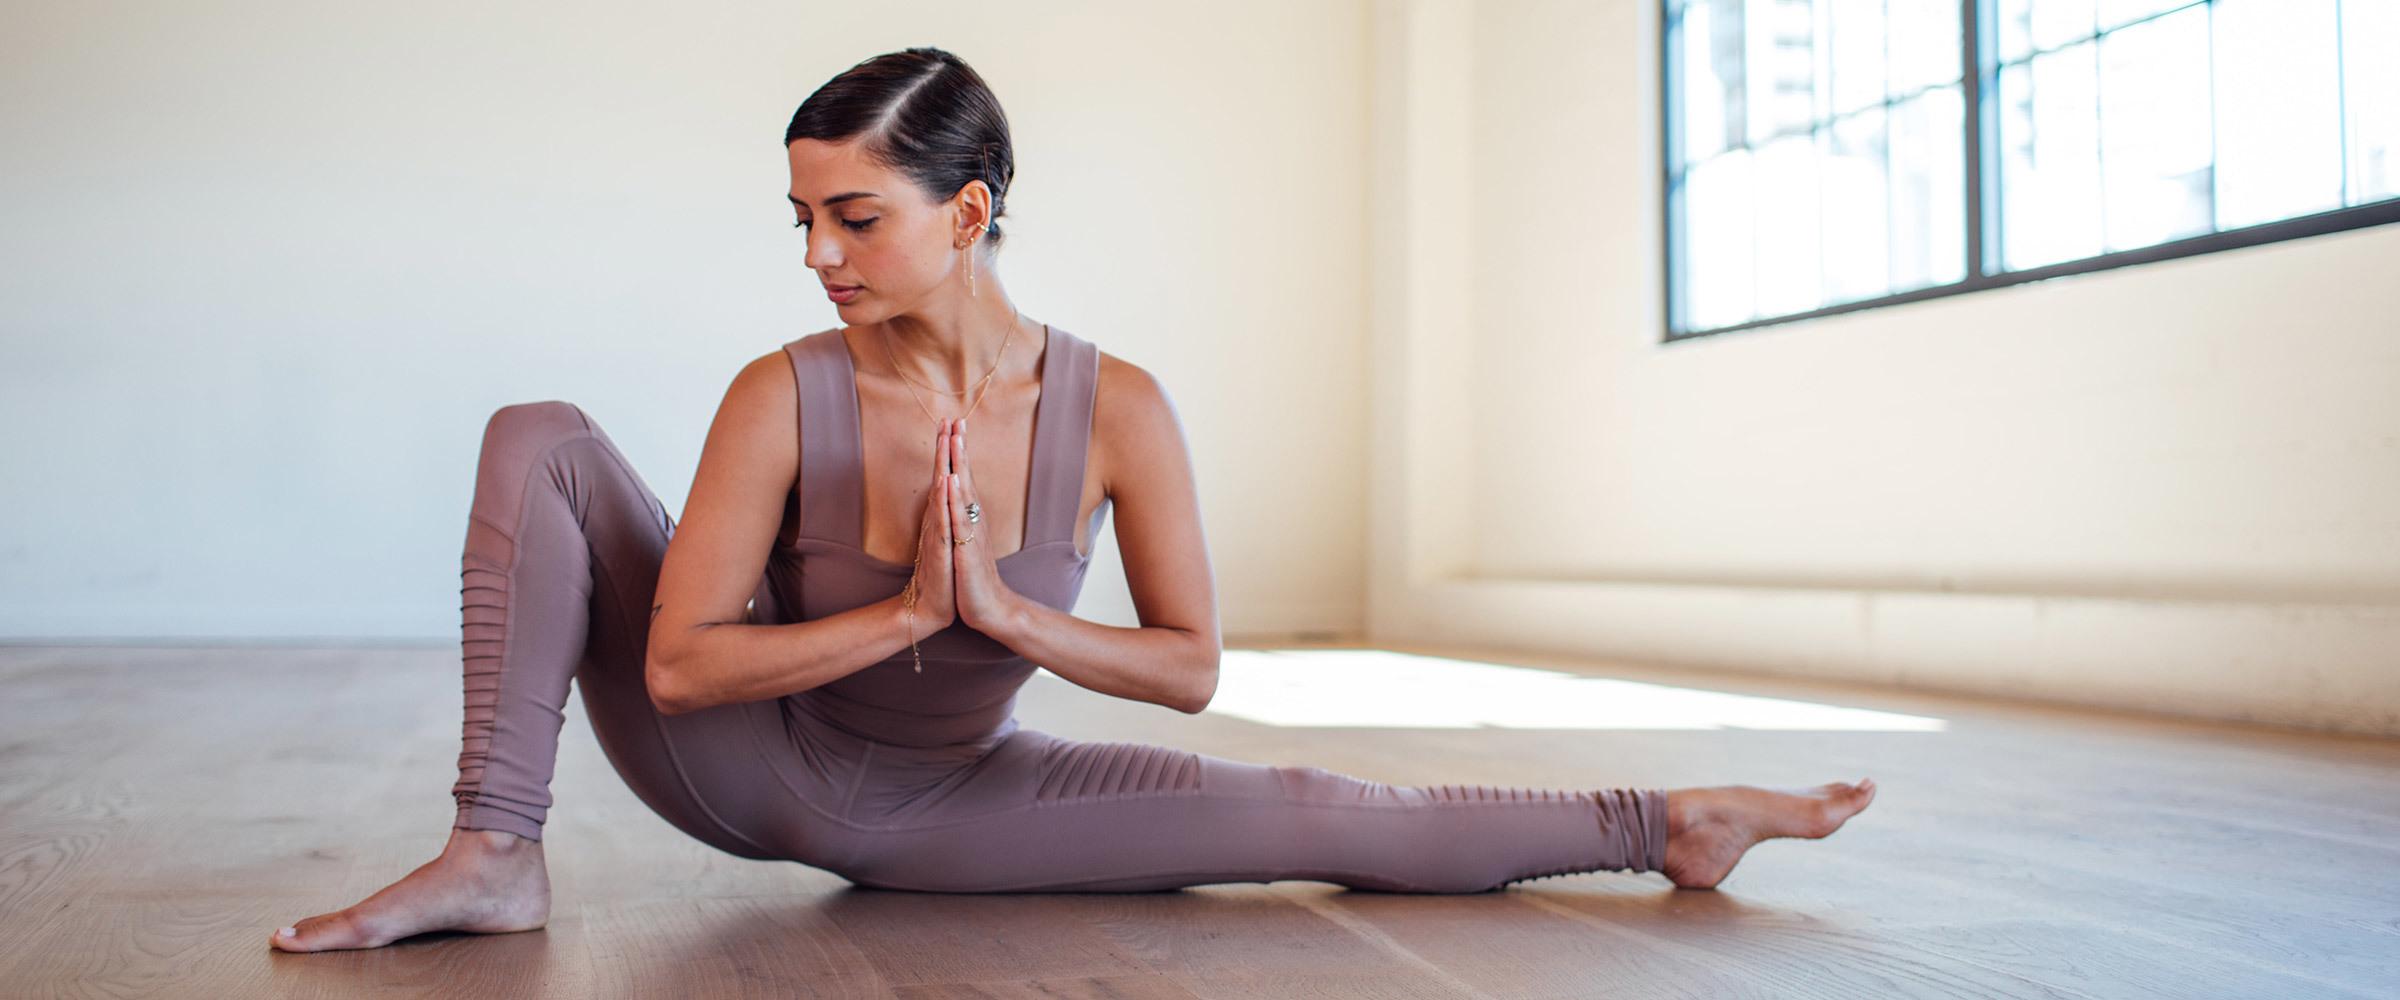 The Method: Flexibility